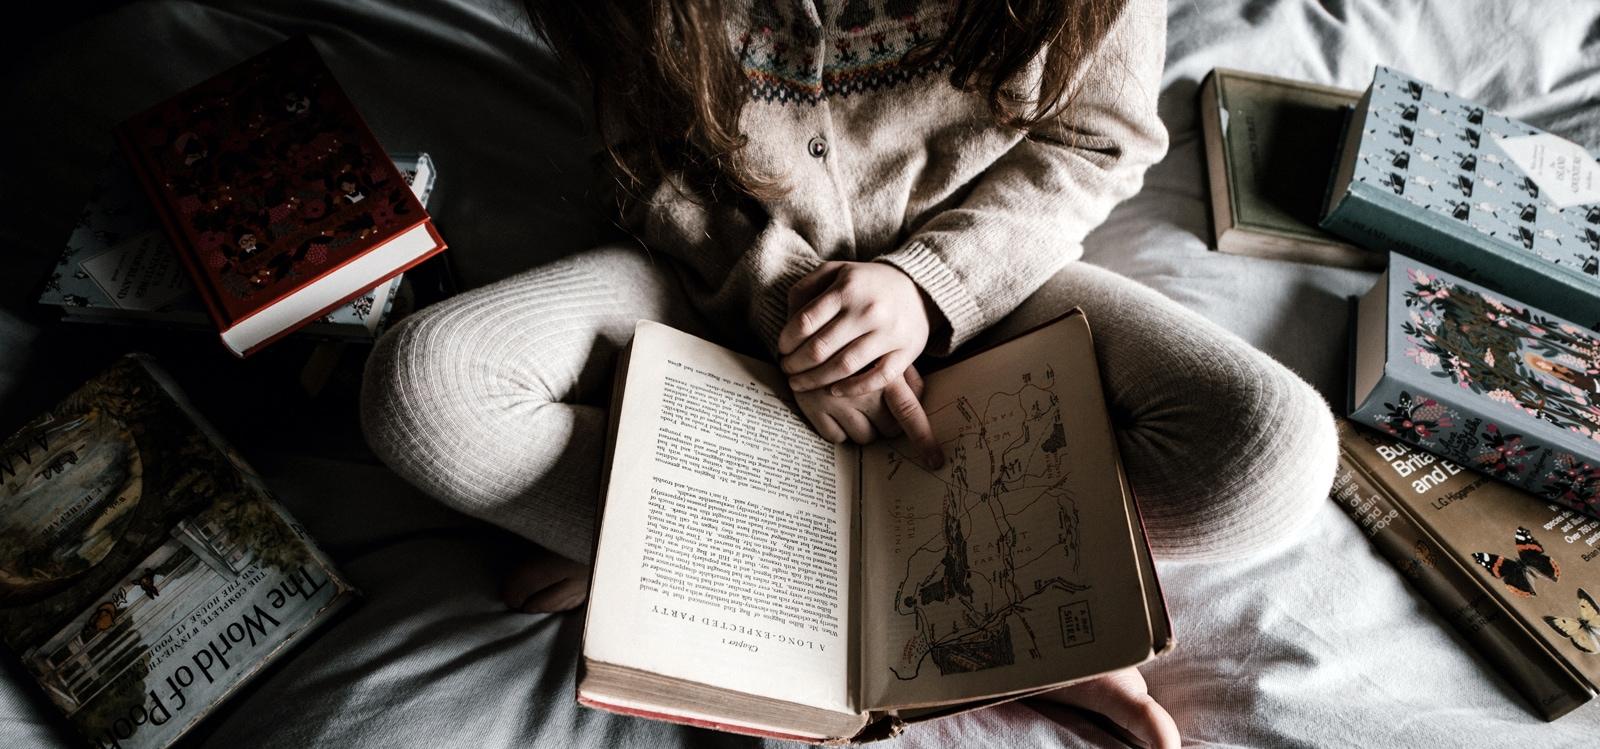 libri-da-regalare-a-nataleDESK